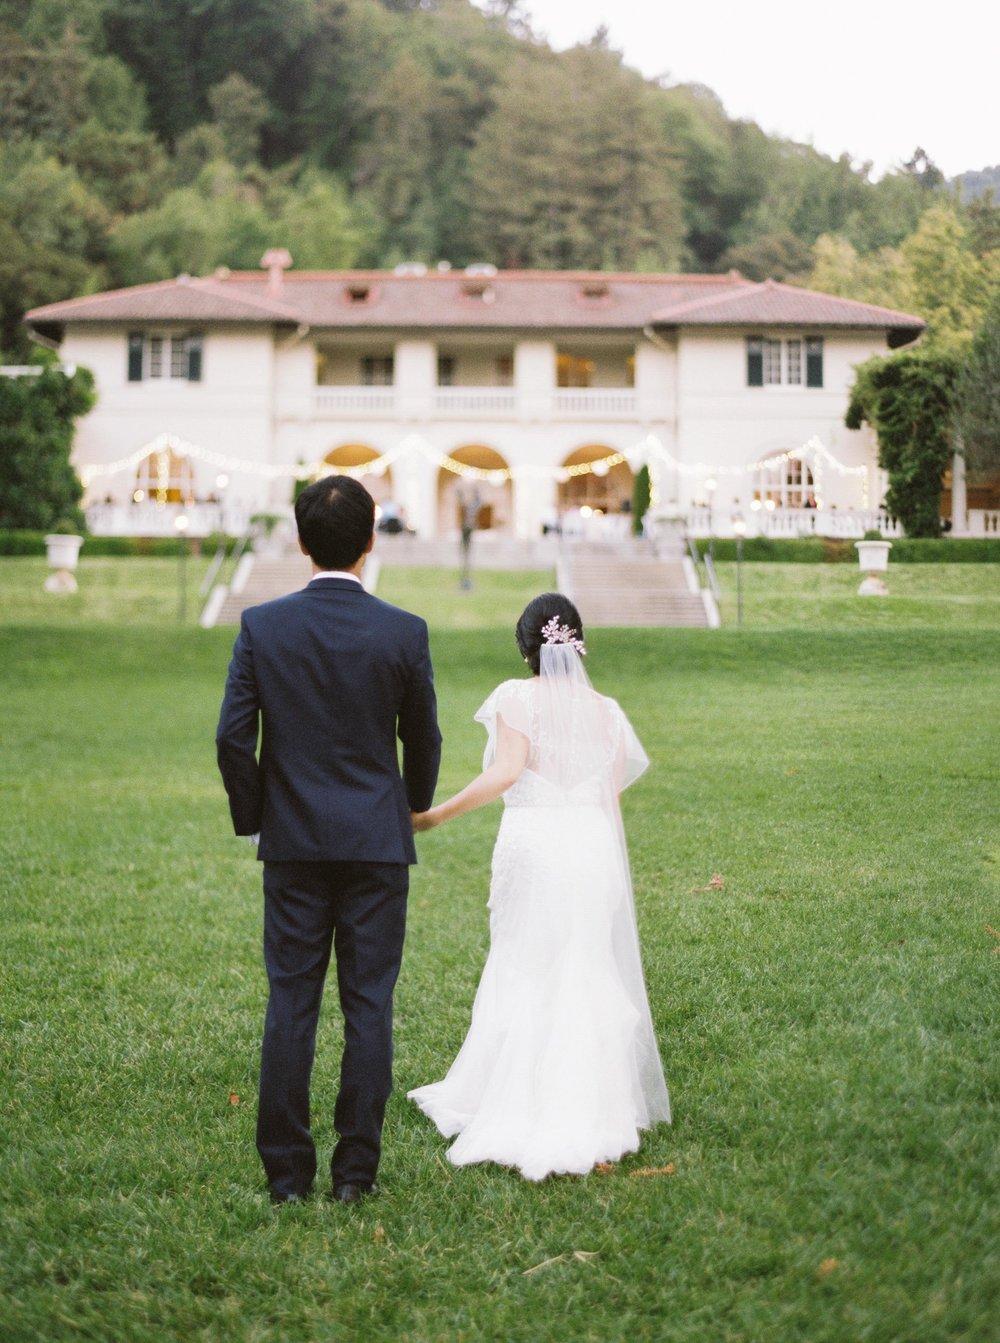 Villa_Montalvo_Wedding_Photographer_Videographer_San_Francisco192.jpg